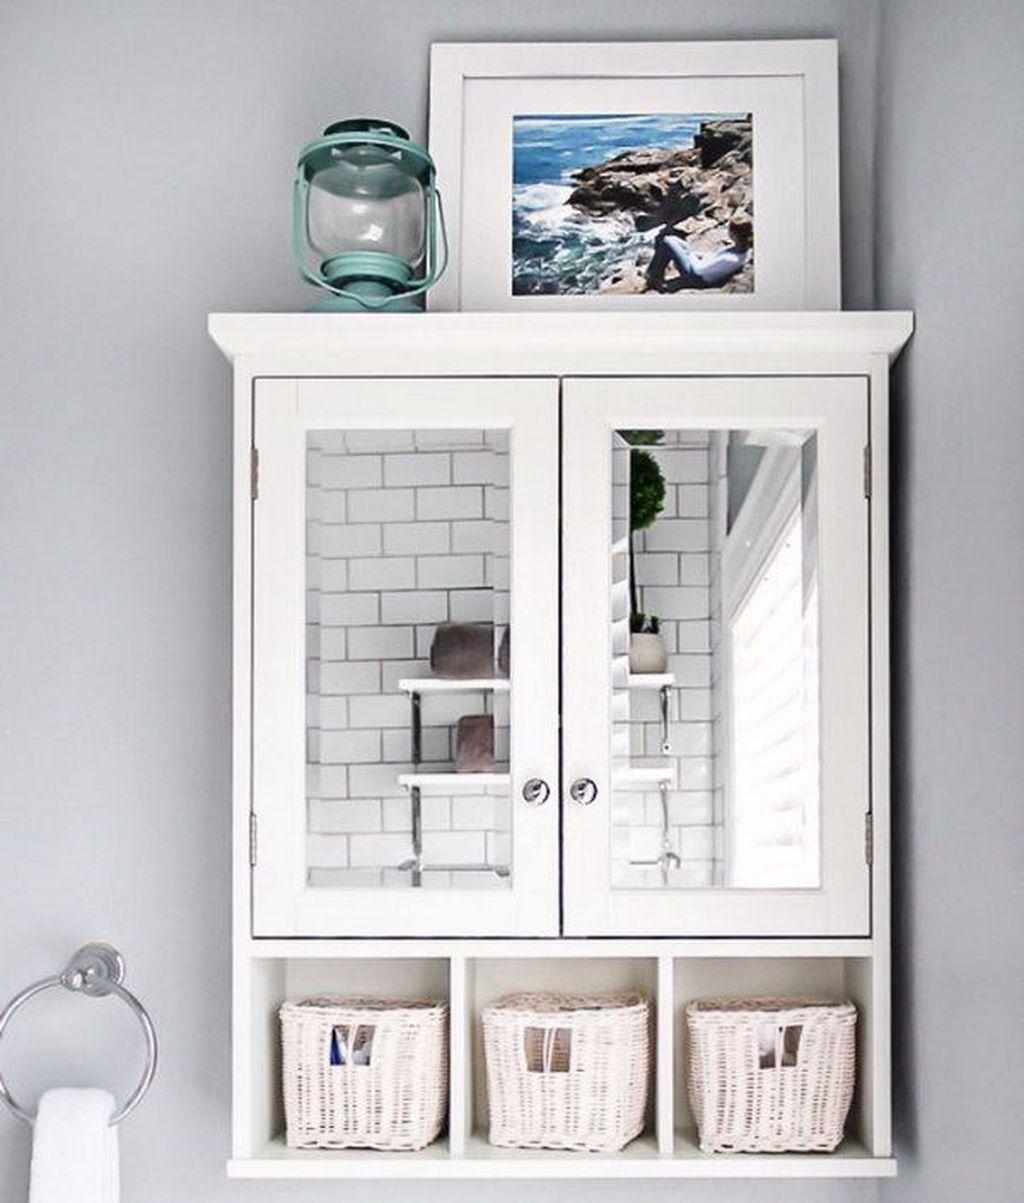 30 Simply Small Bathroom Storage Ideas In 2020 Small Bathroom Small Bathroom Storage Cabinet Above Toilet